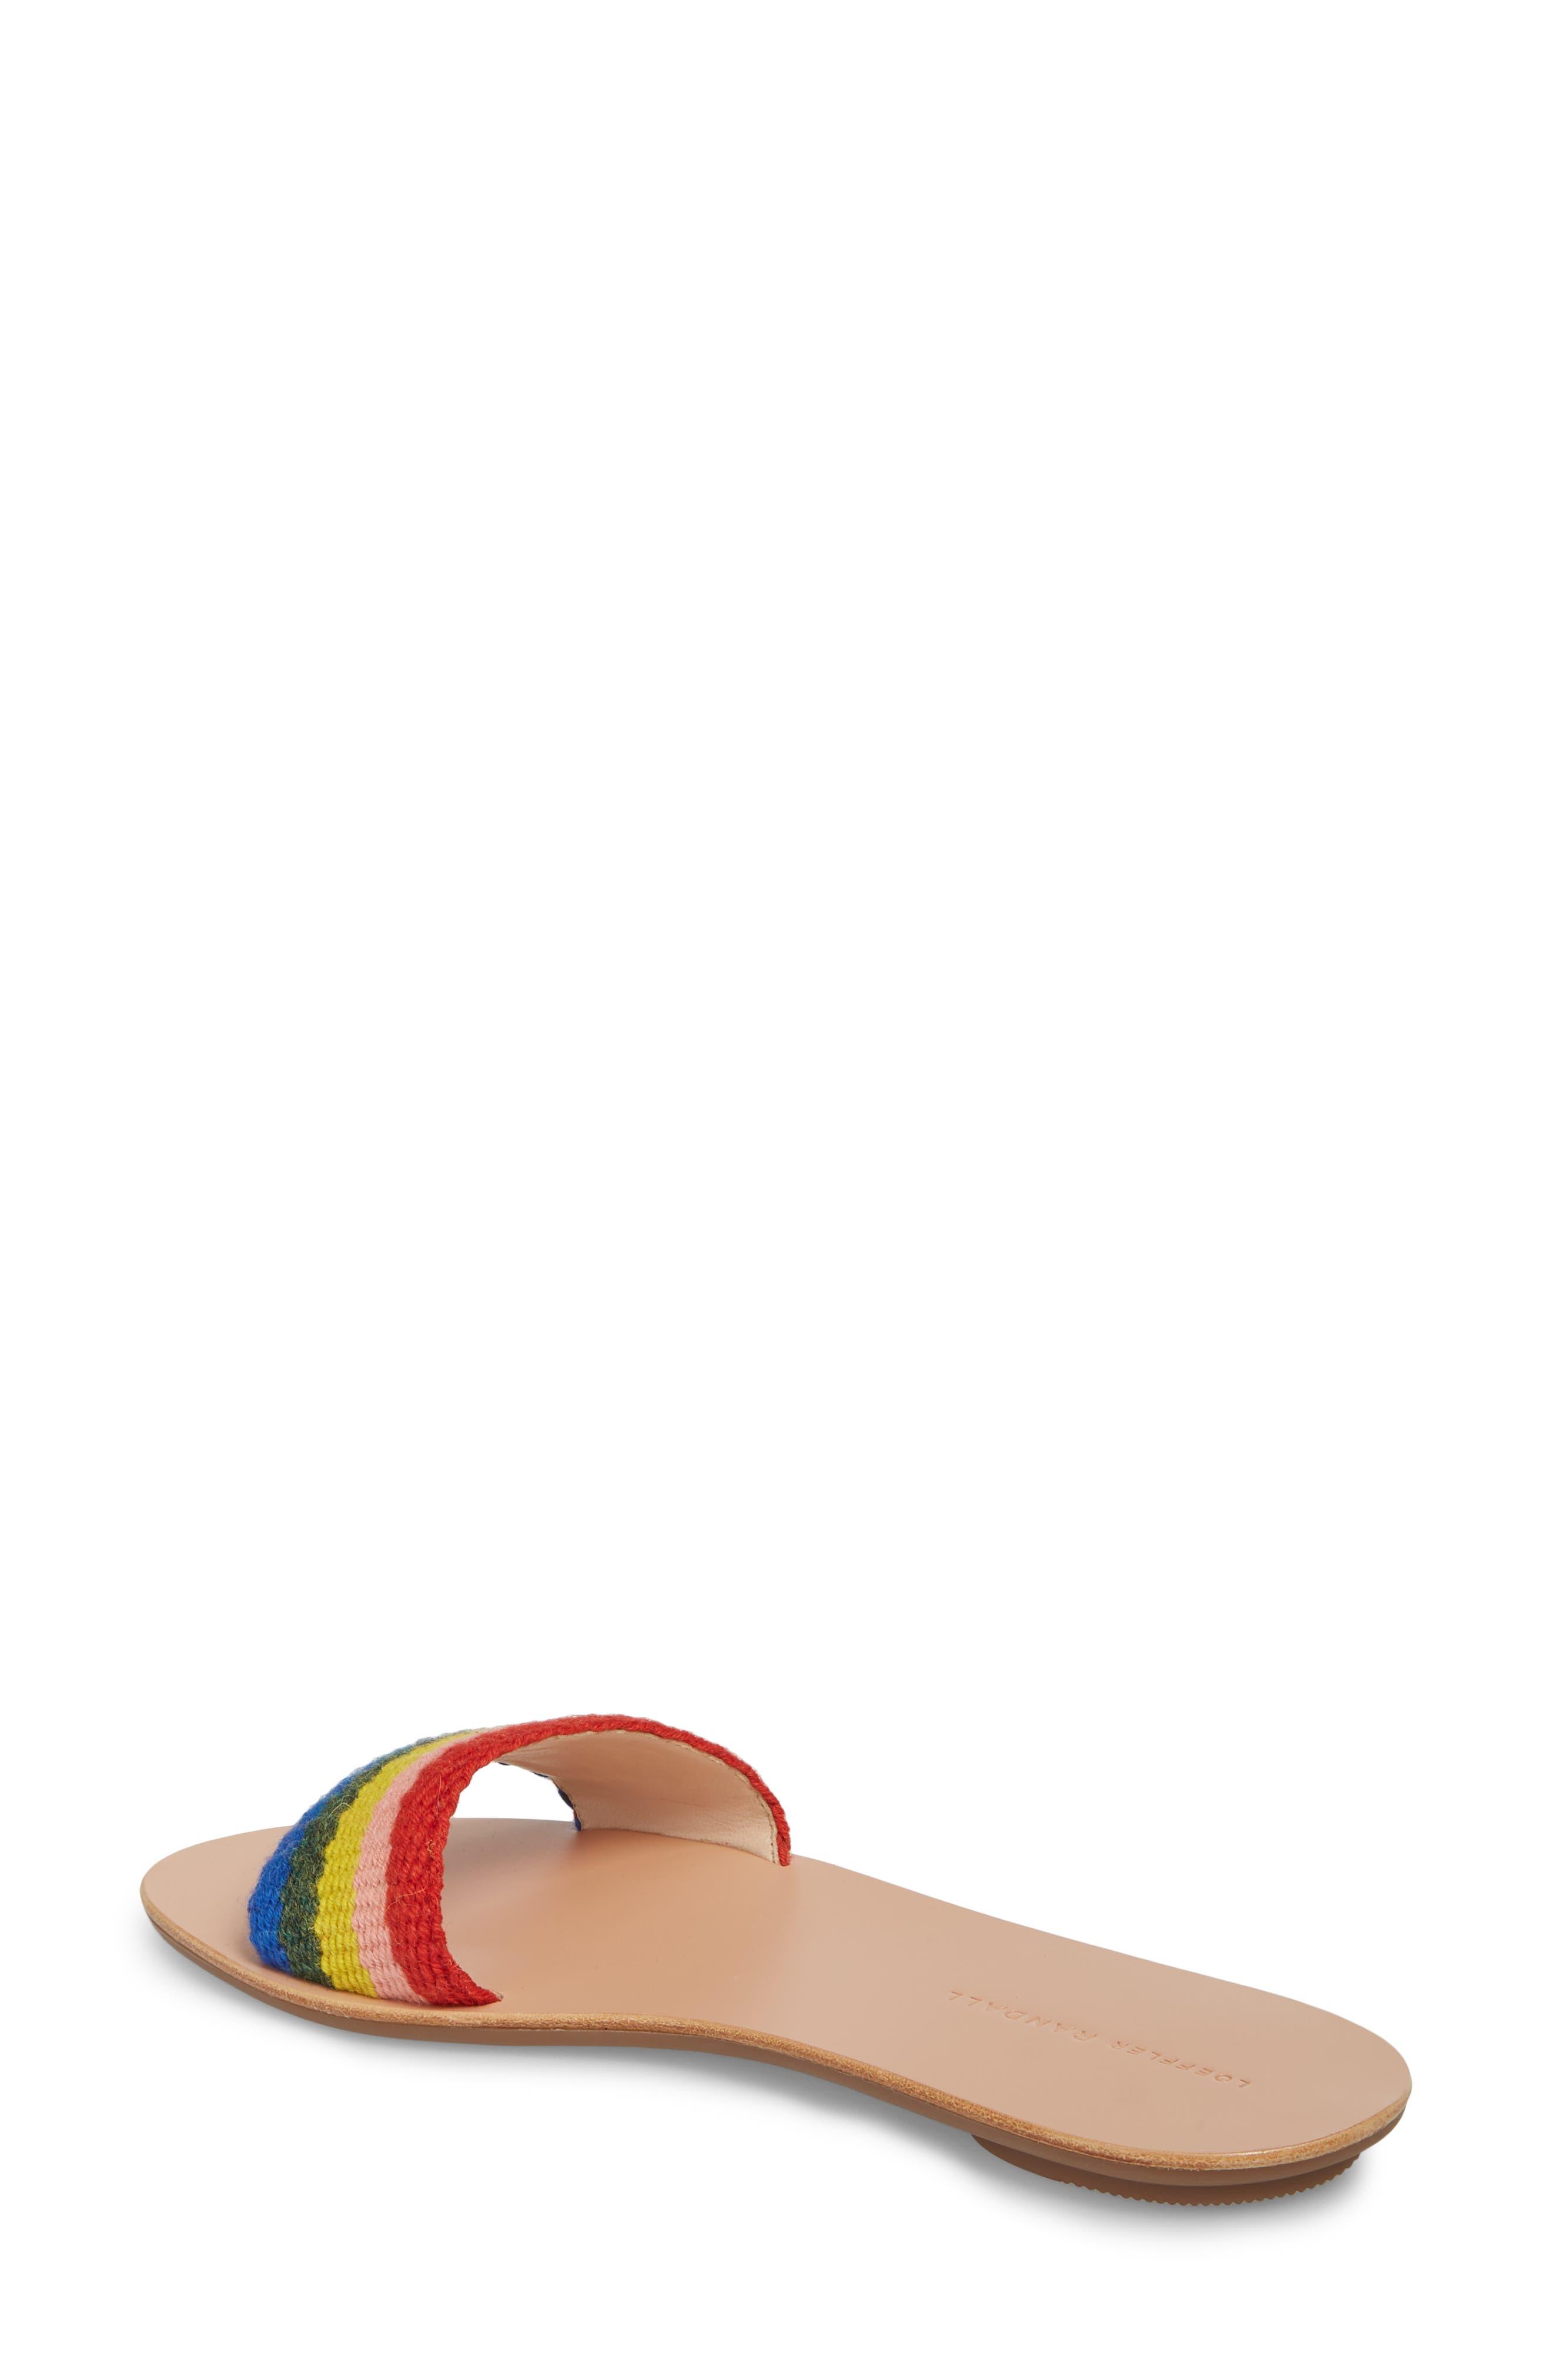 Stella Woven Slide Sandal,                             Alternate thumbnail 2, color,                             Rainbow Fabric